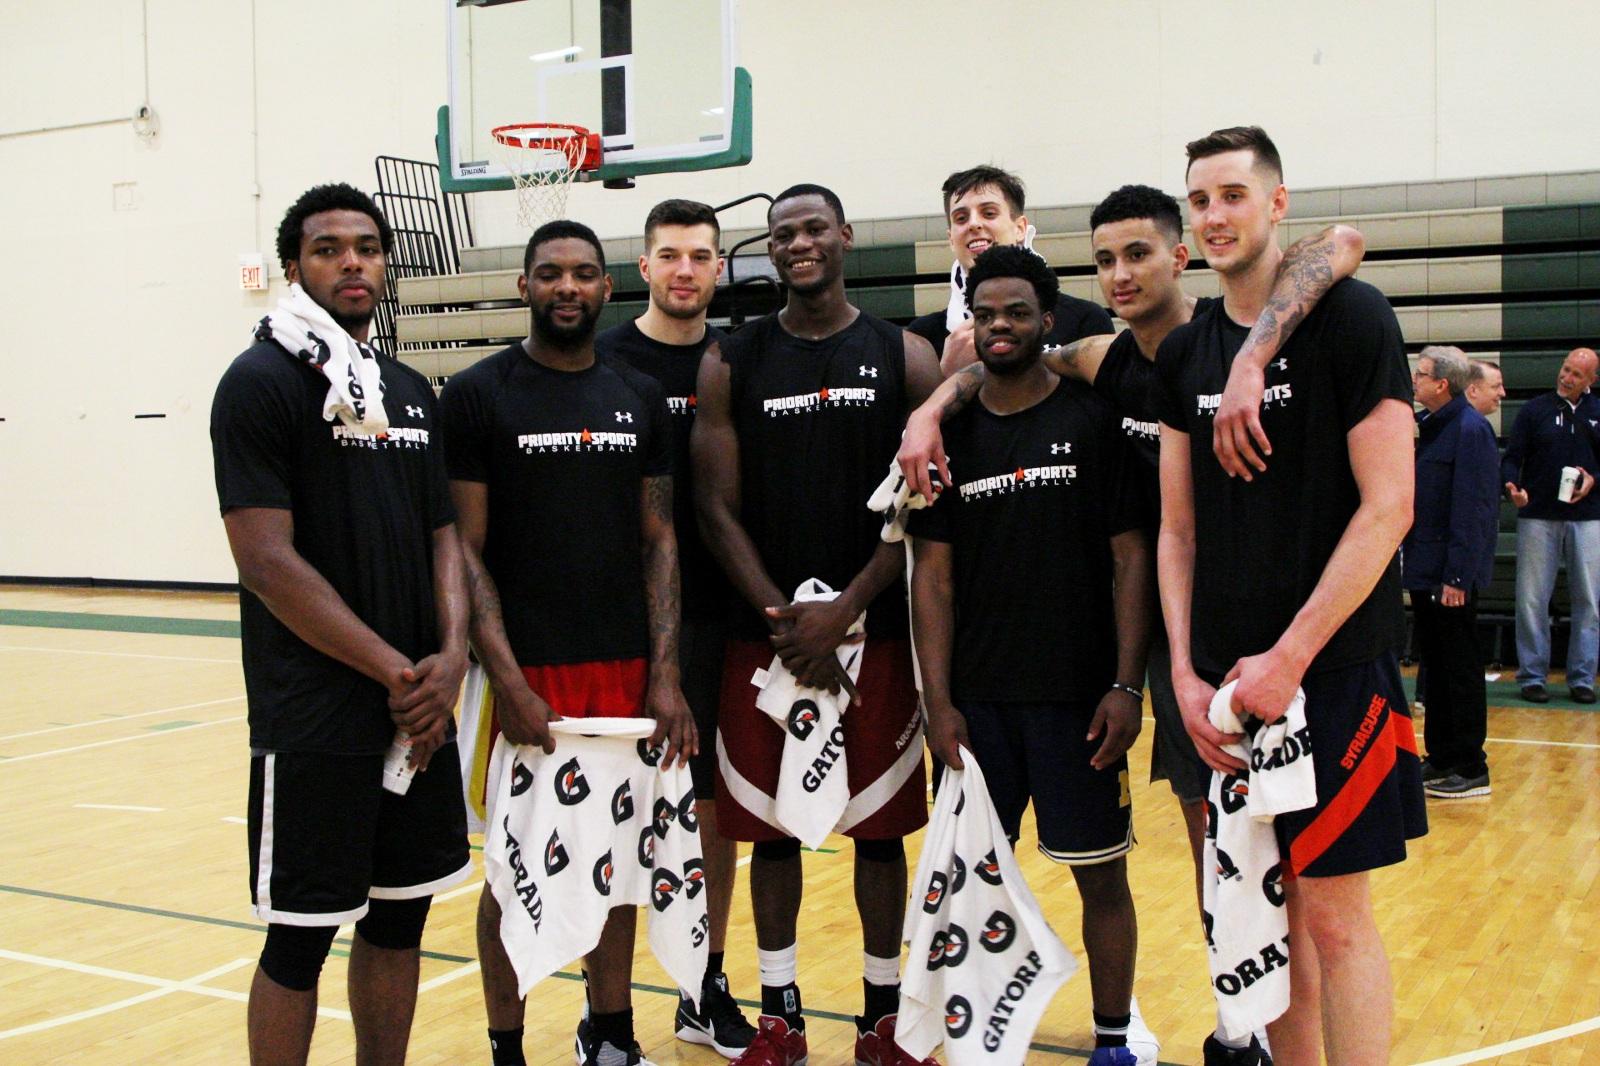 2017 GZT NBA Pre-Draft Class: Sterling Brown, Sindarius Thornwell, Alec Peters, Moses Kingsley, Zach Collins, Derrick Walton Jr., Kyle Kuzma, and Tyler Lydon